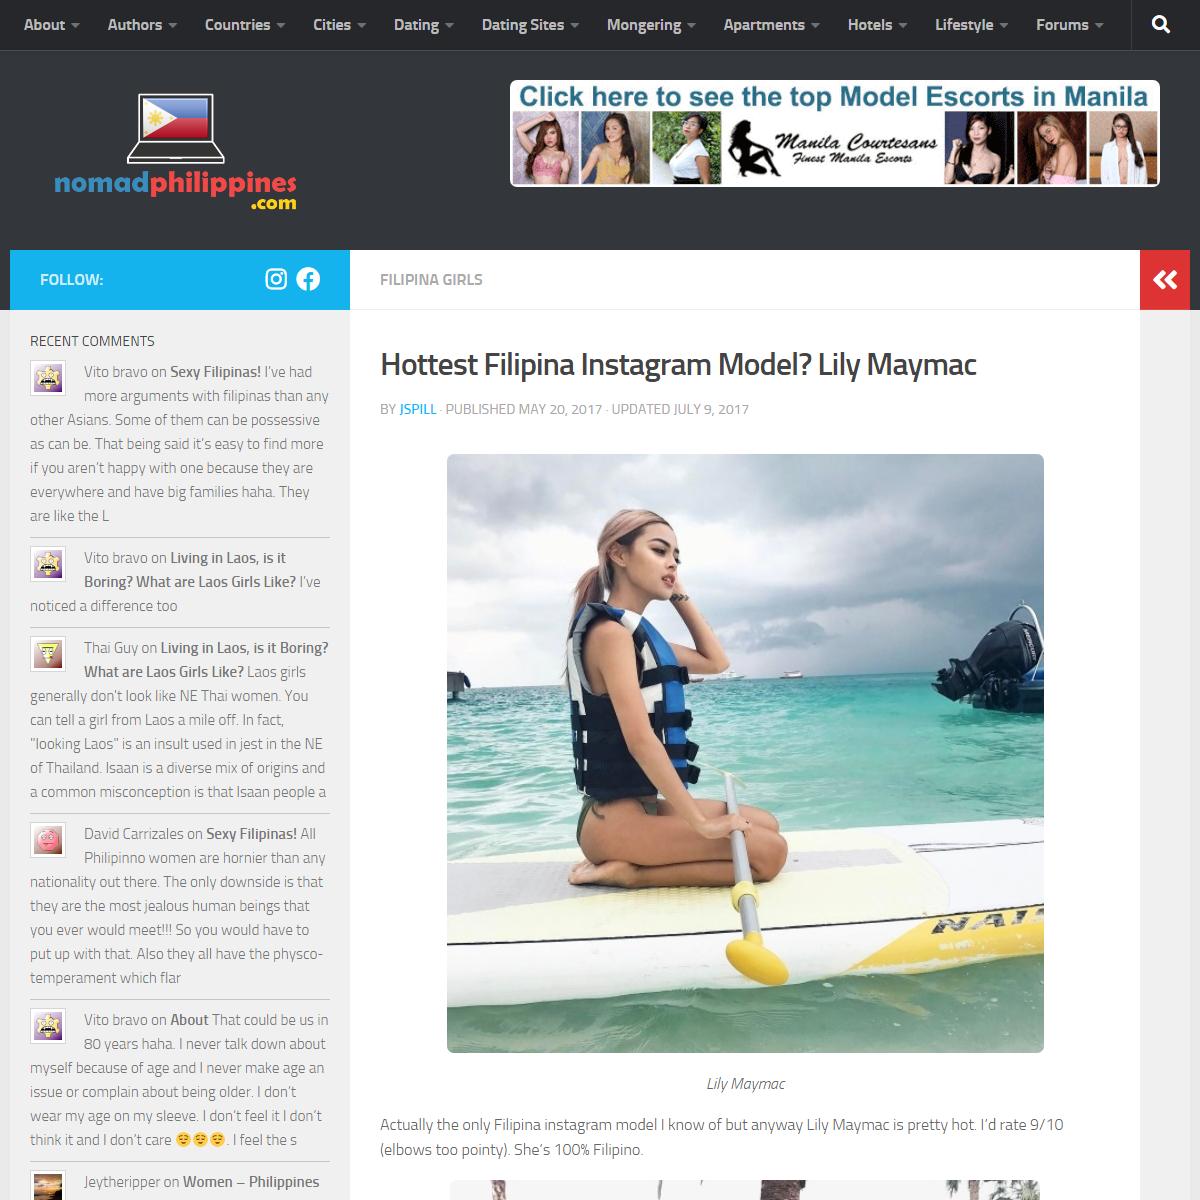 Hottest Filipina Instagram Model- Lily Maymac